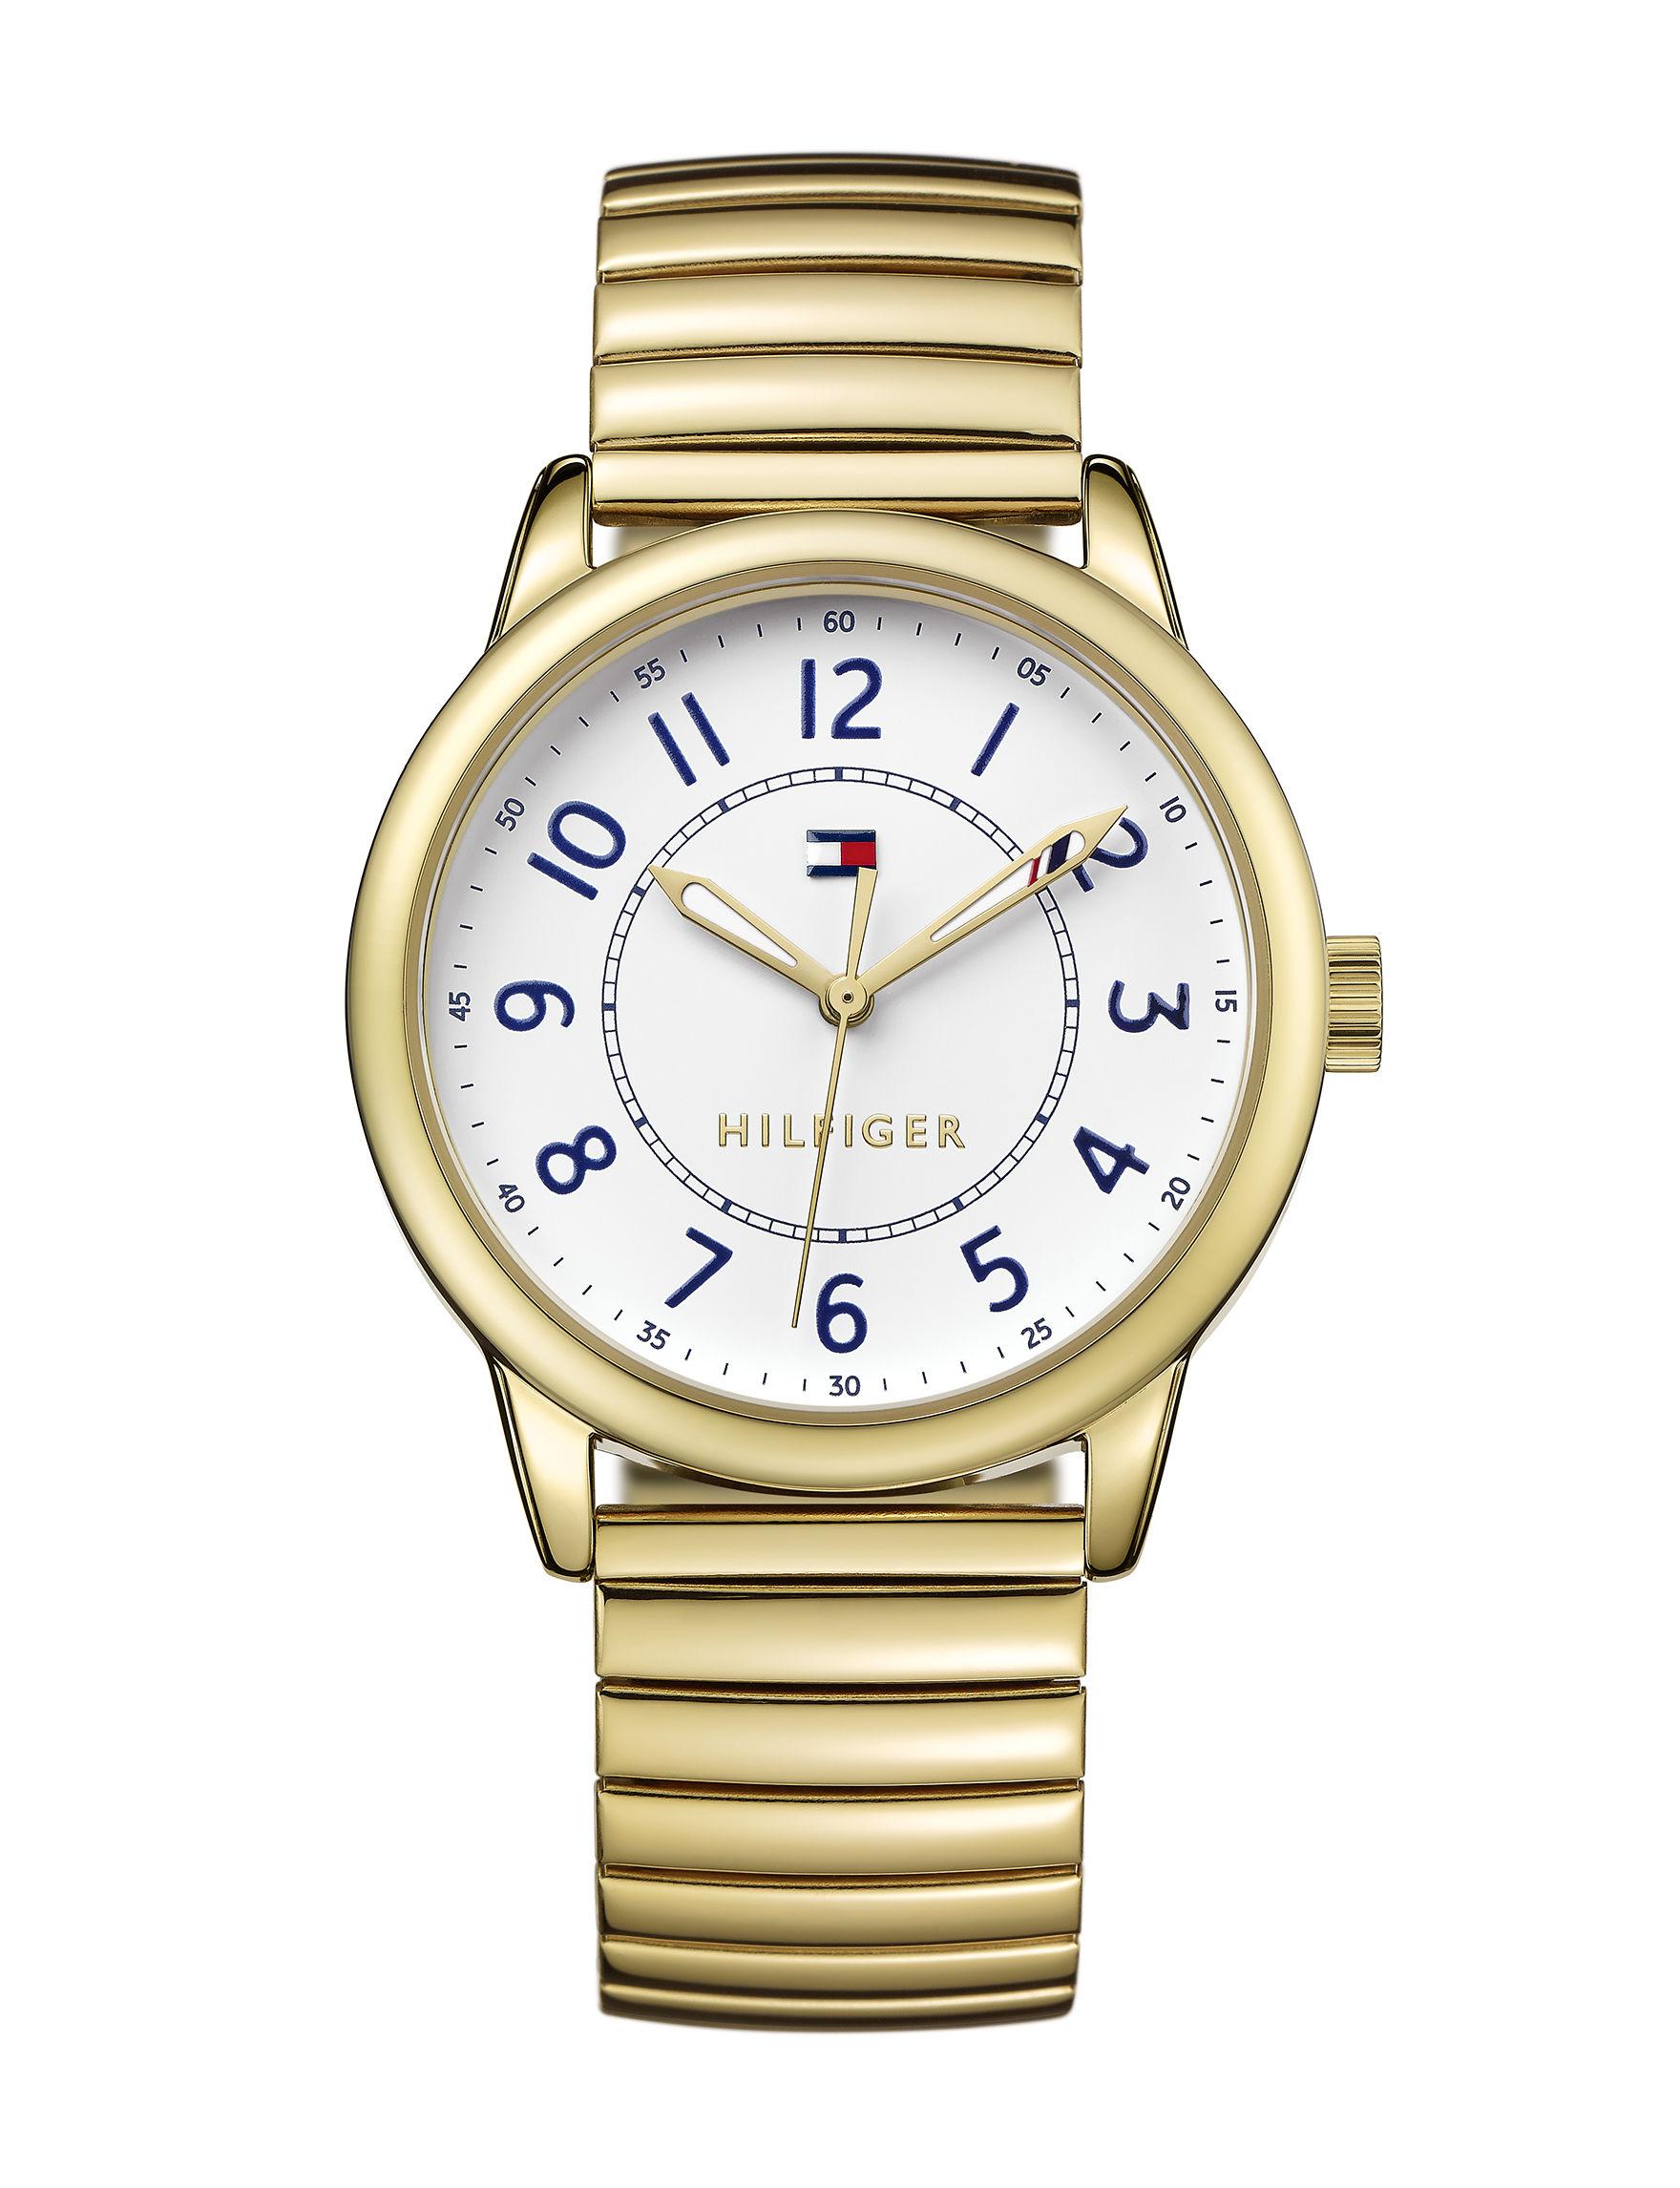 Tommy Hilfiger White Fashion Watches